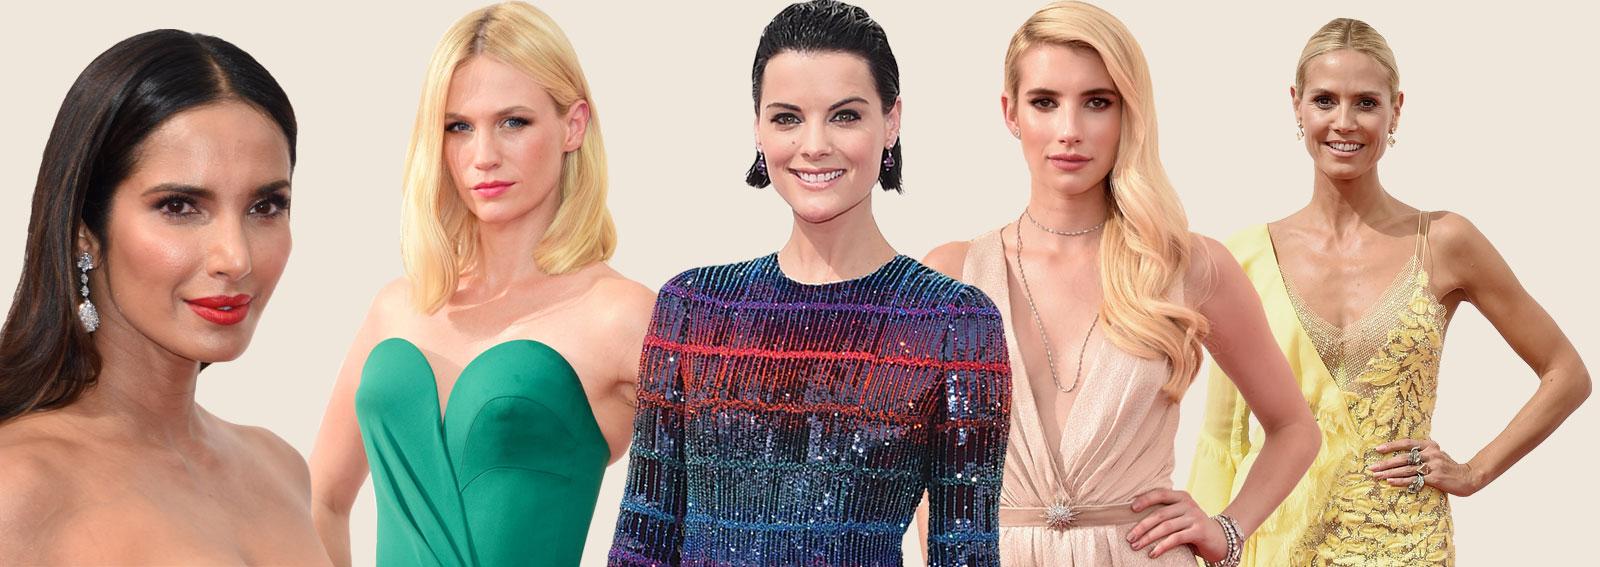 cover-emmy-awards-2015-beauty-look-desktop